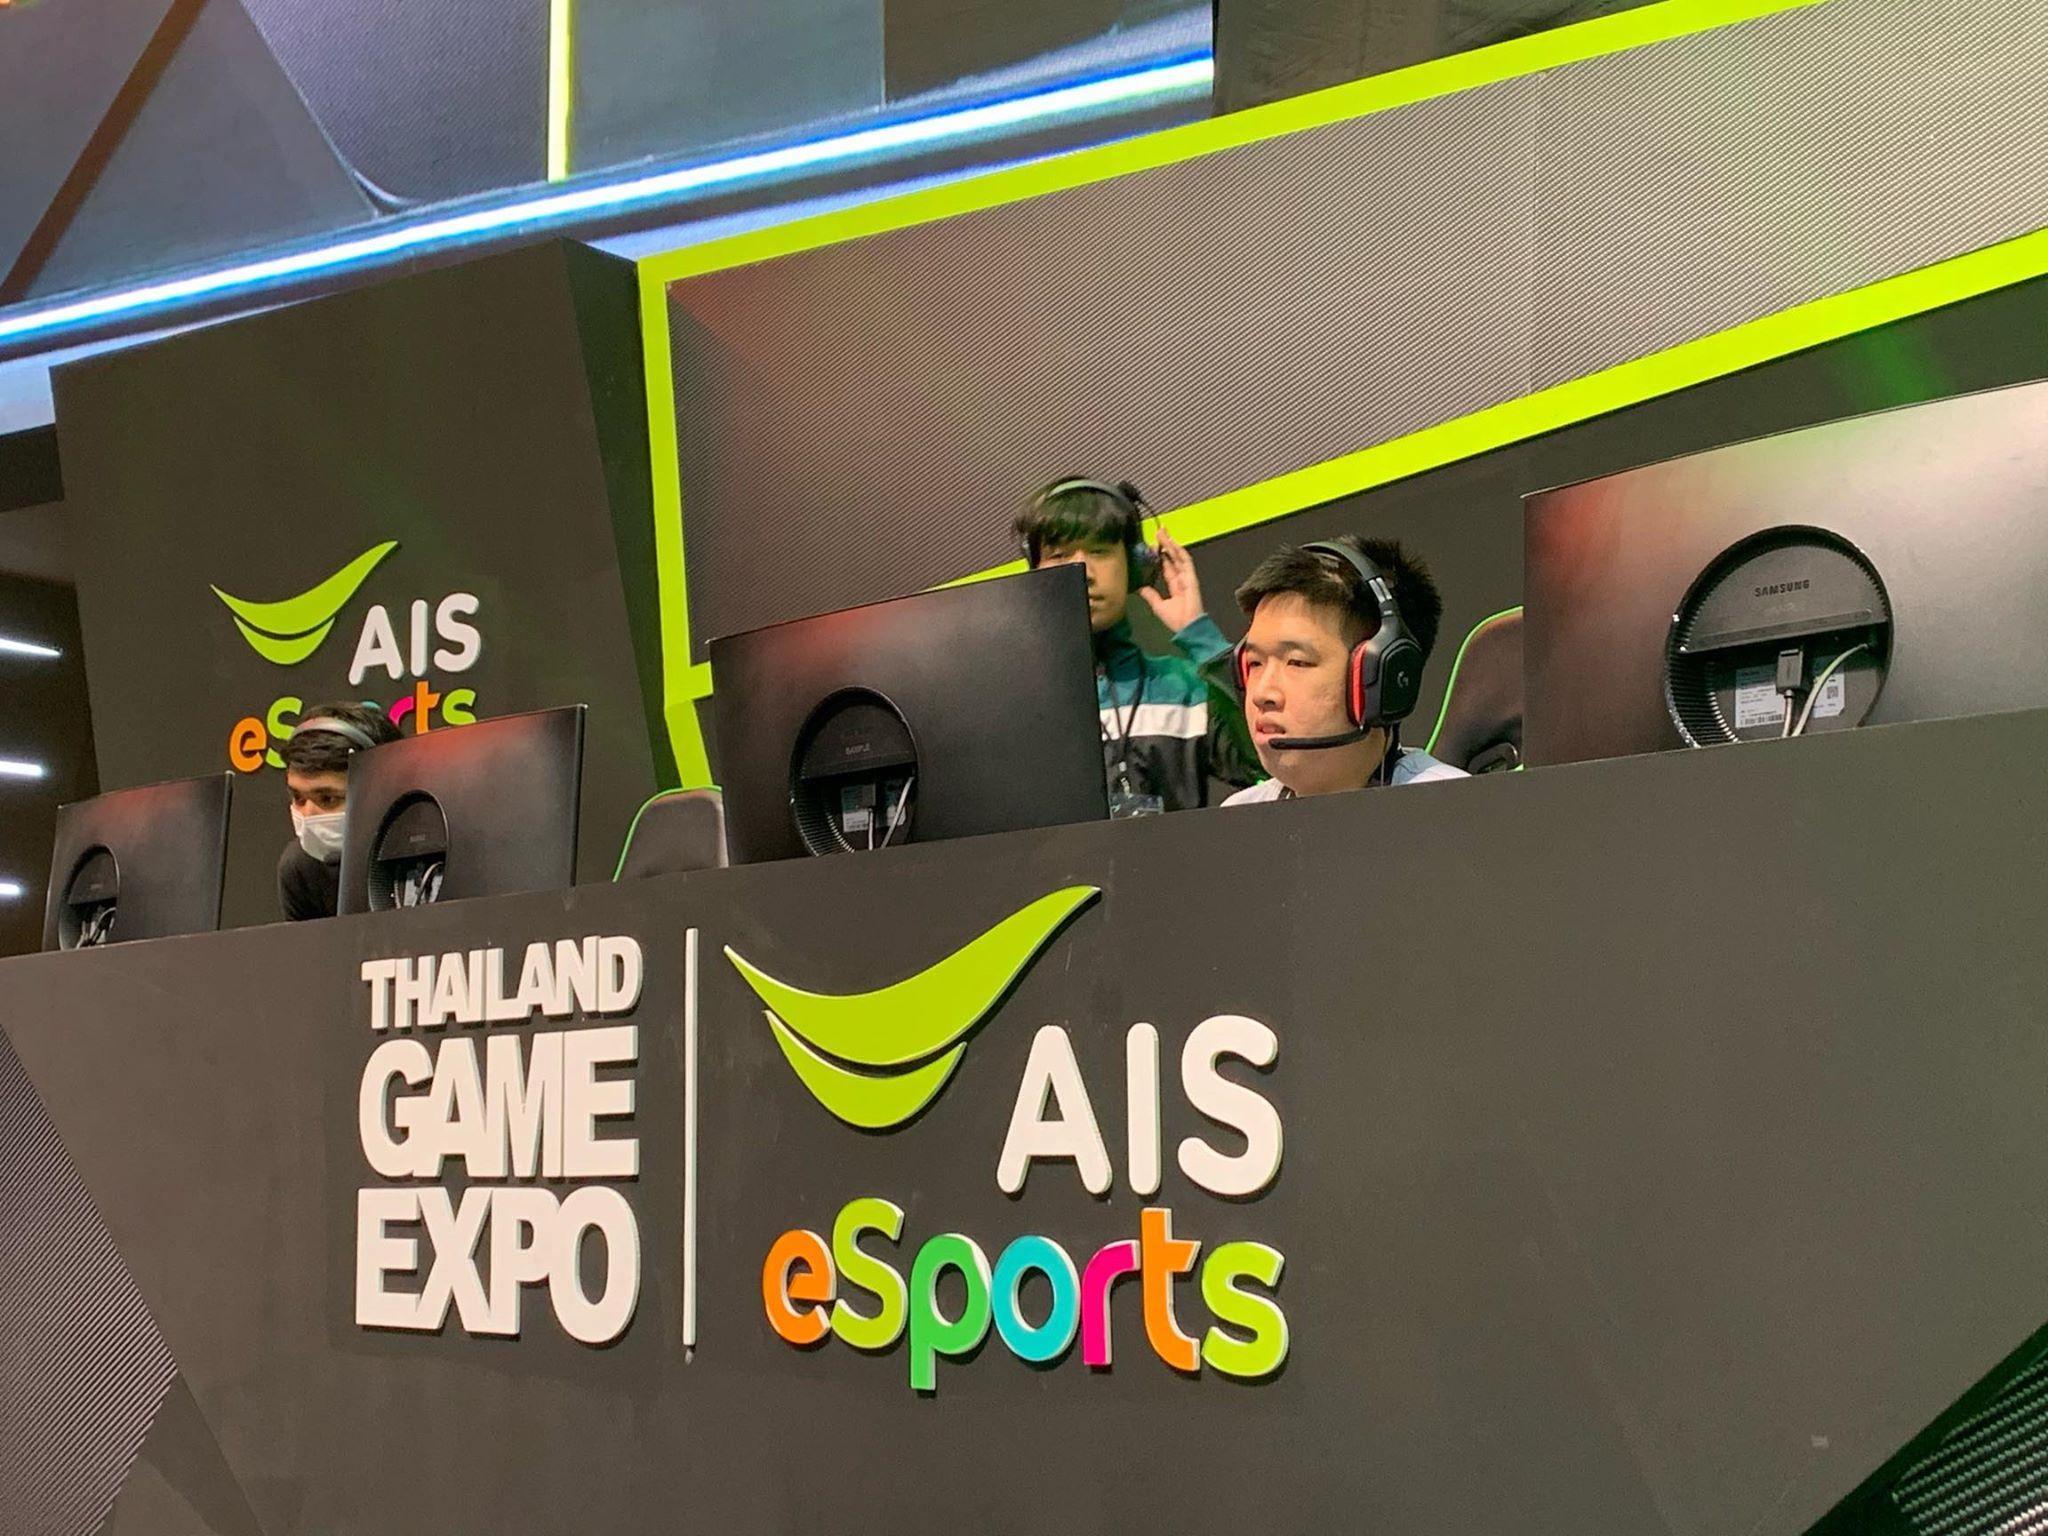 Thailand Game Expo 312020 9